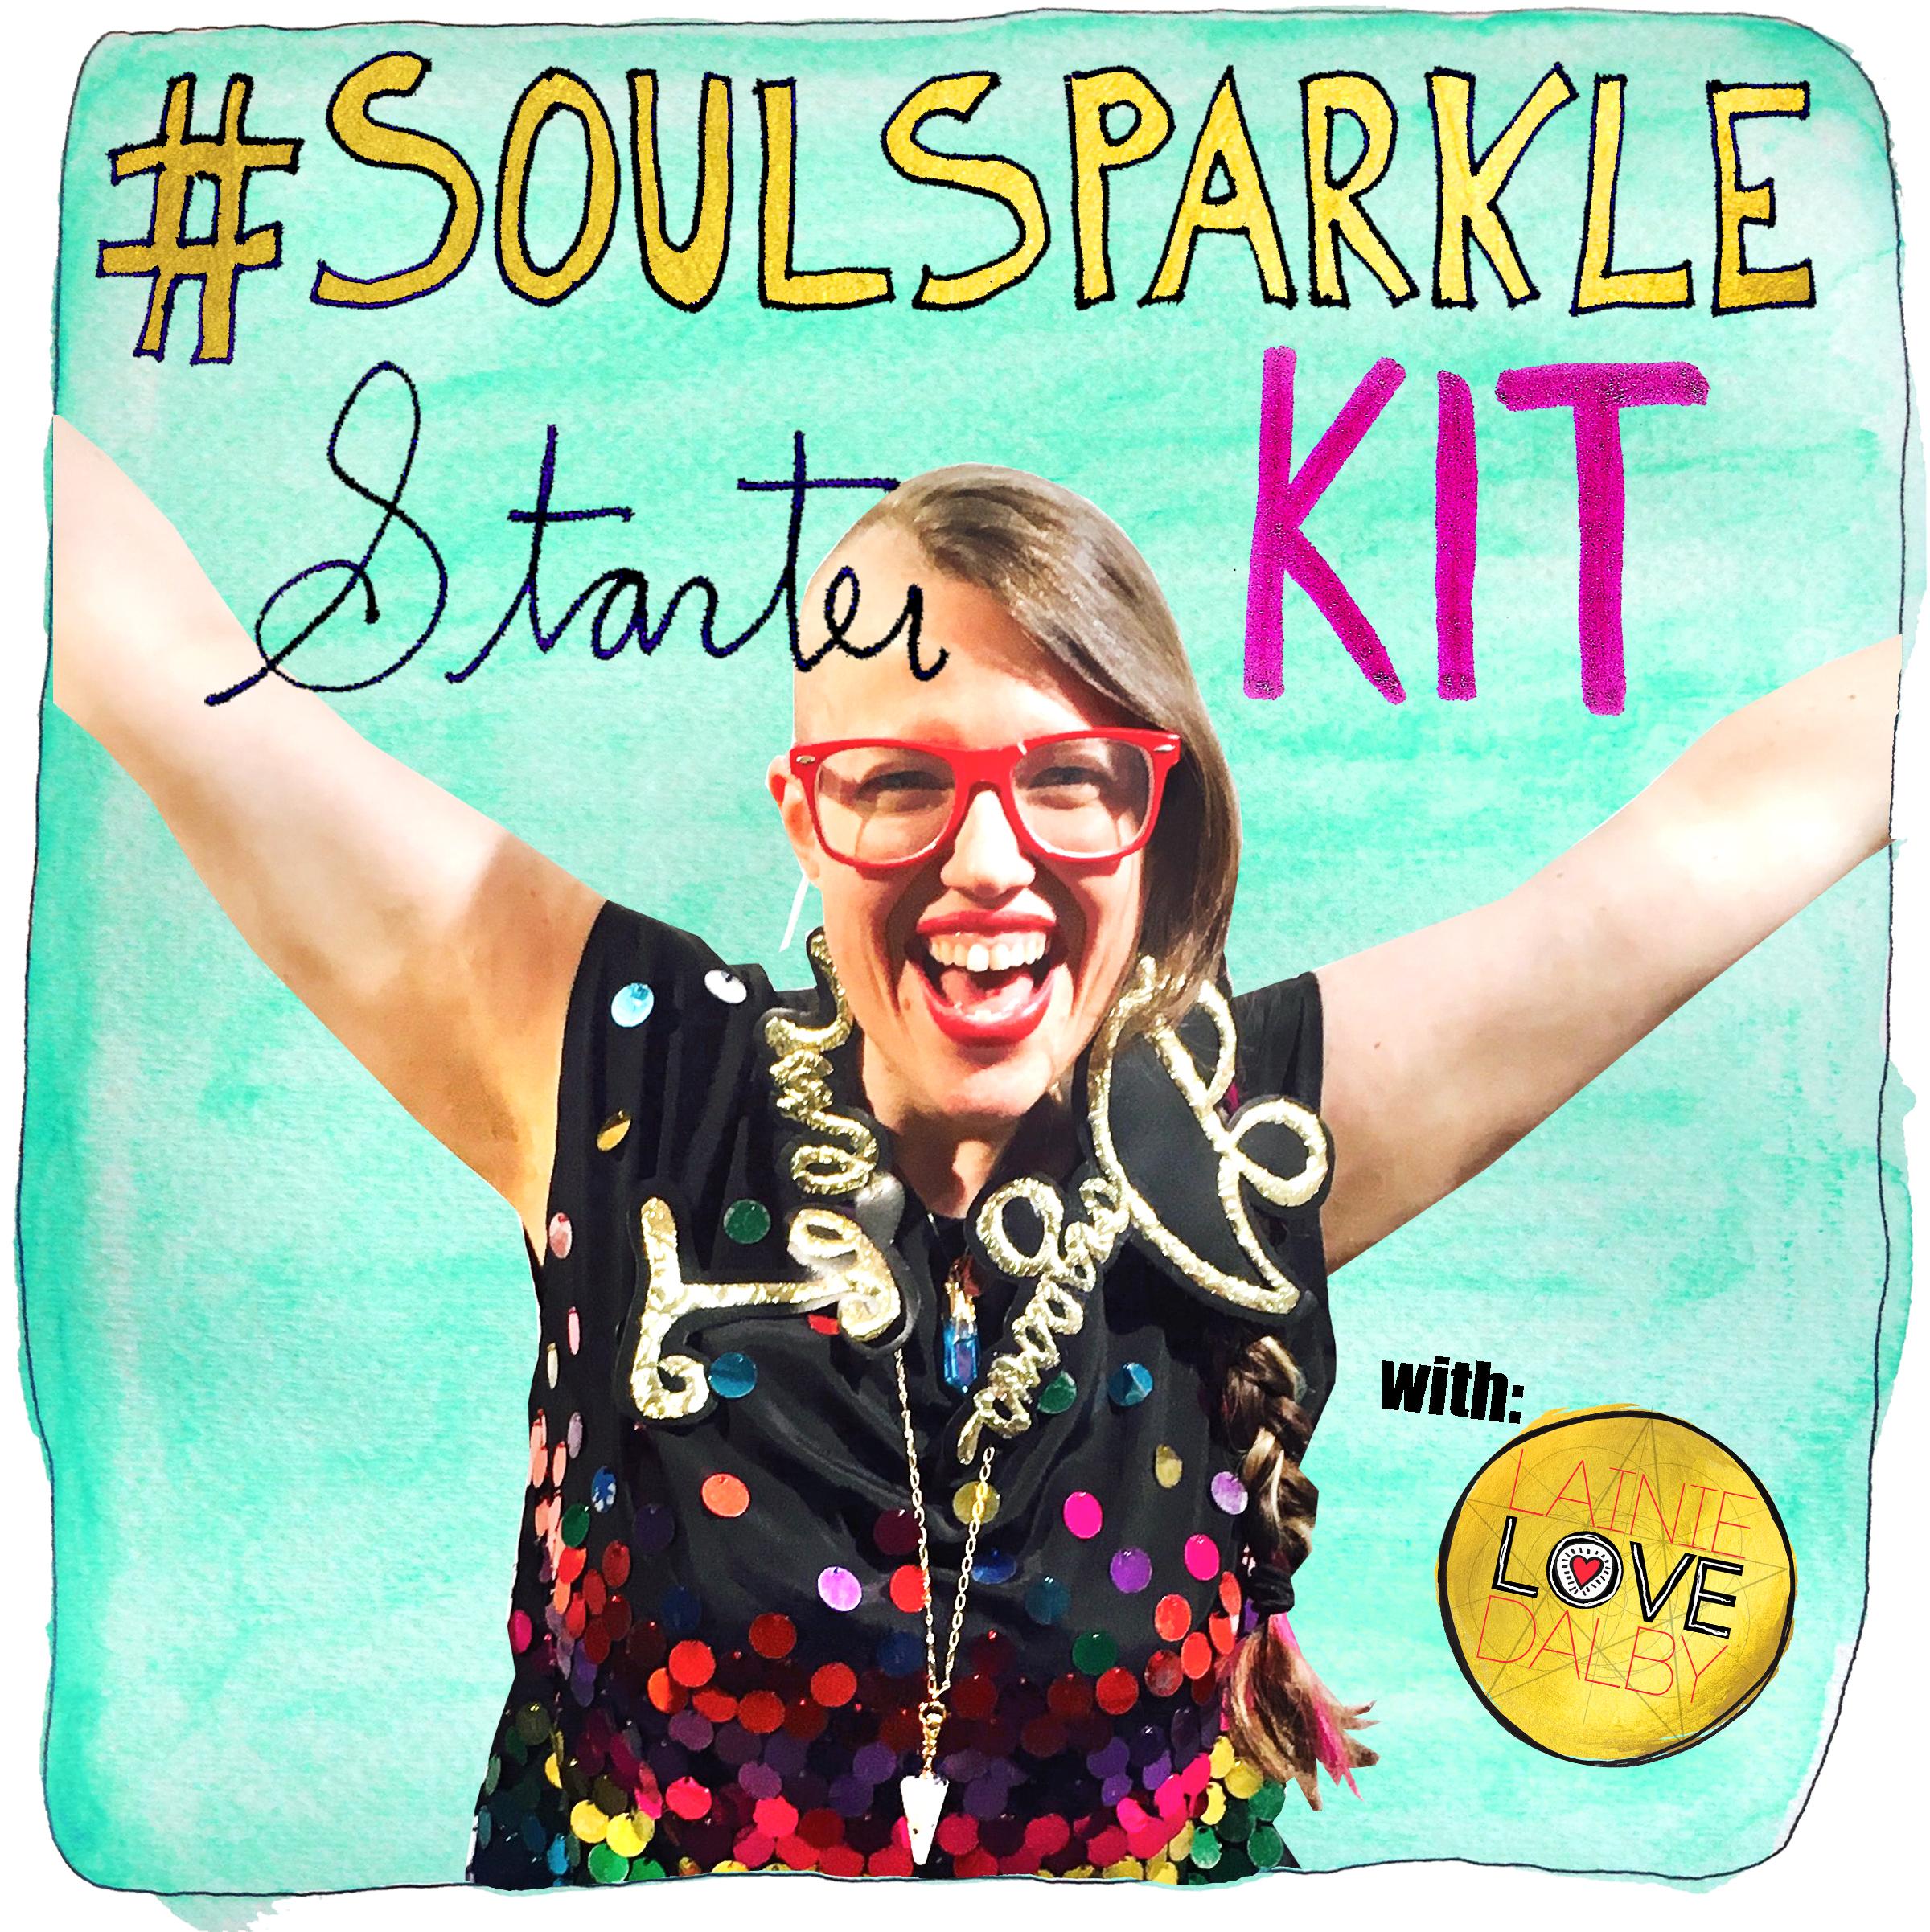 #SOULSPARKLE Starter Kit promo image.jpg